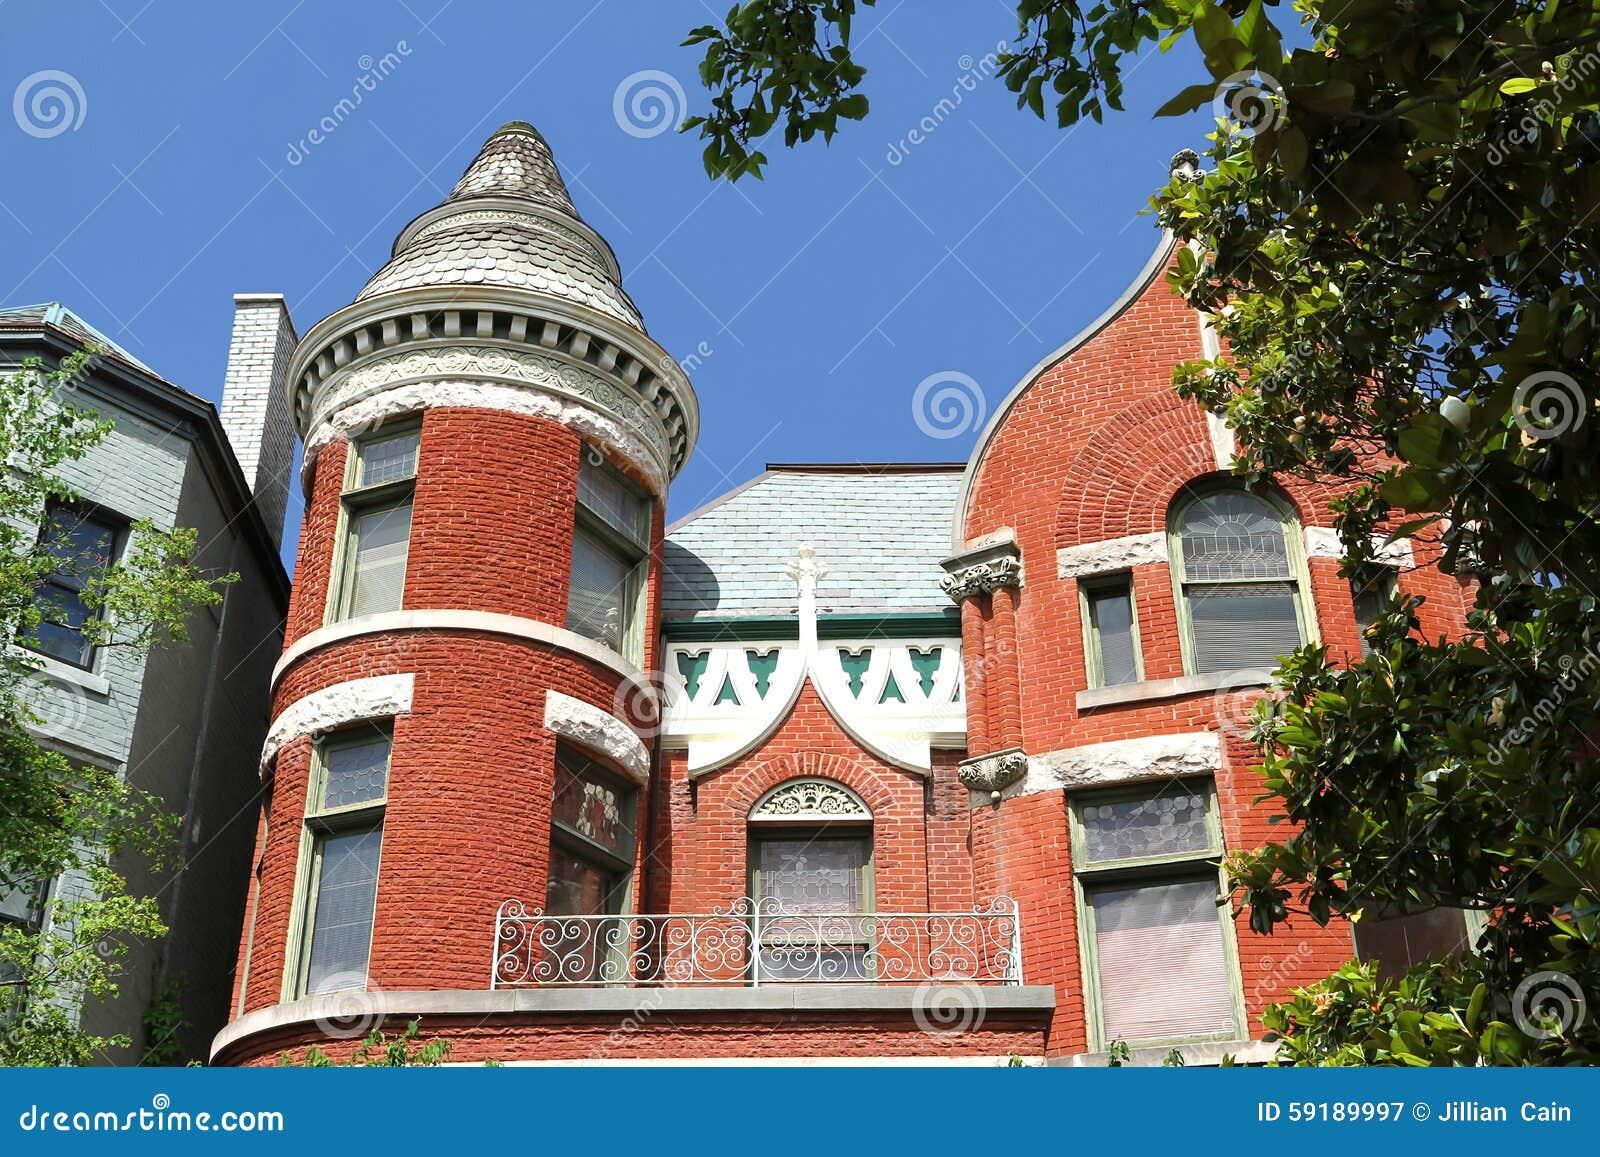 Victorian facade in Old Louisville, Kentucky, USA